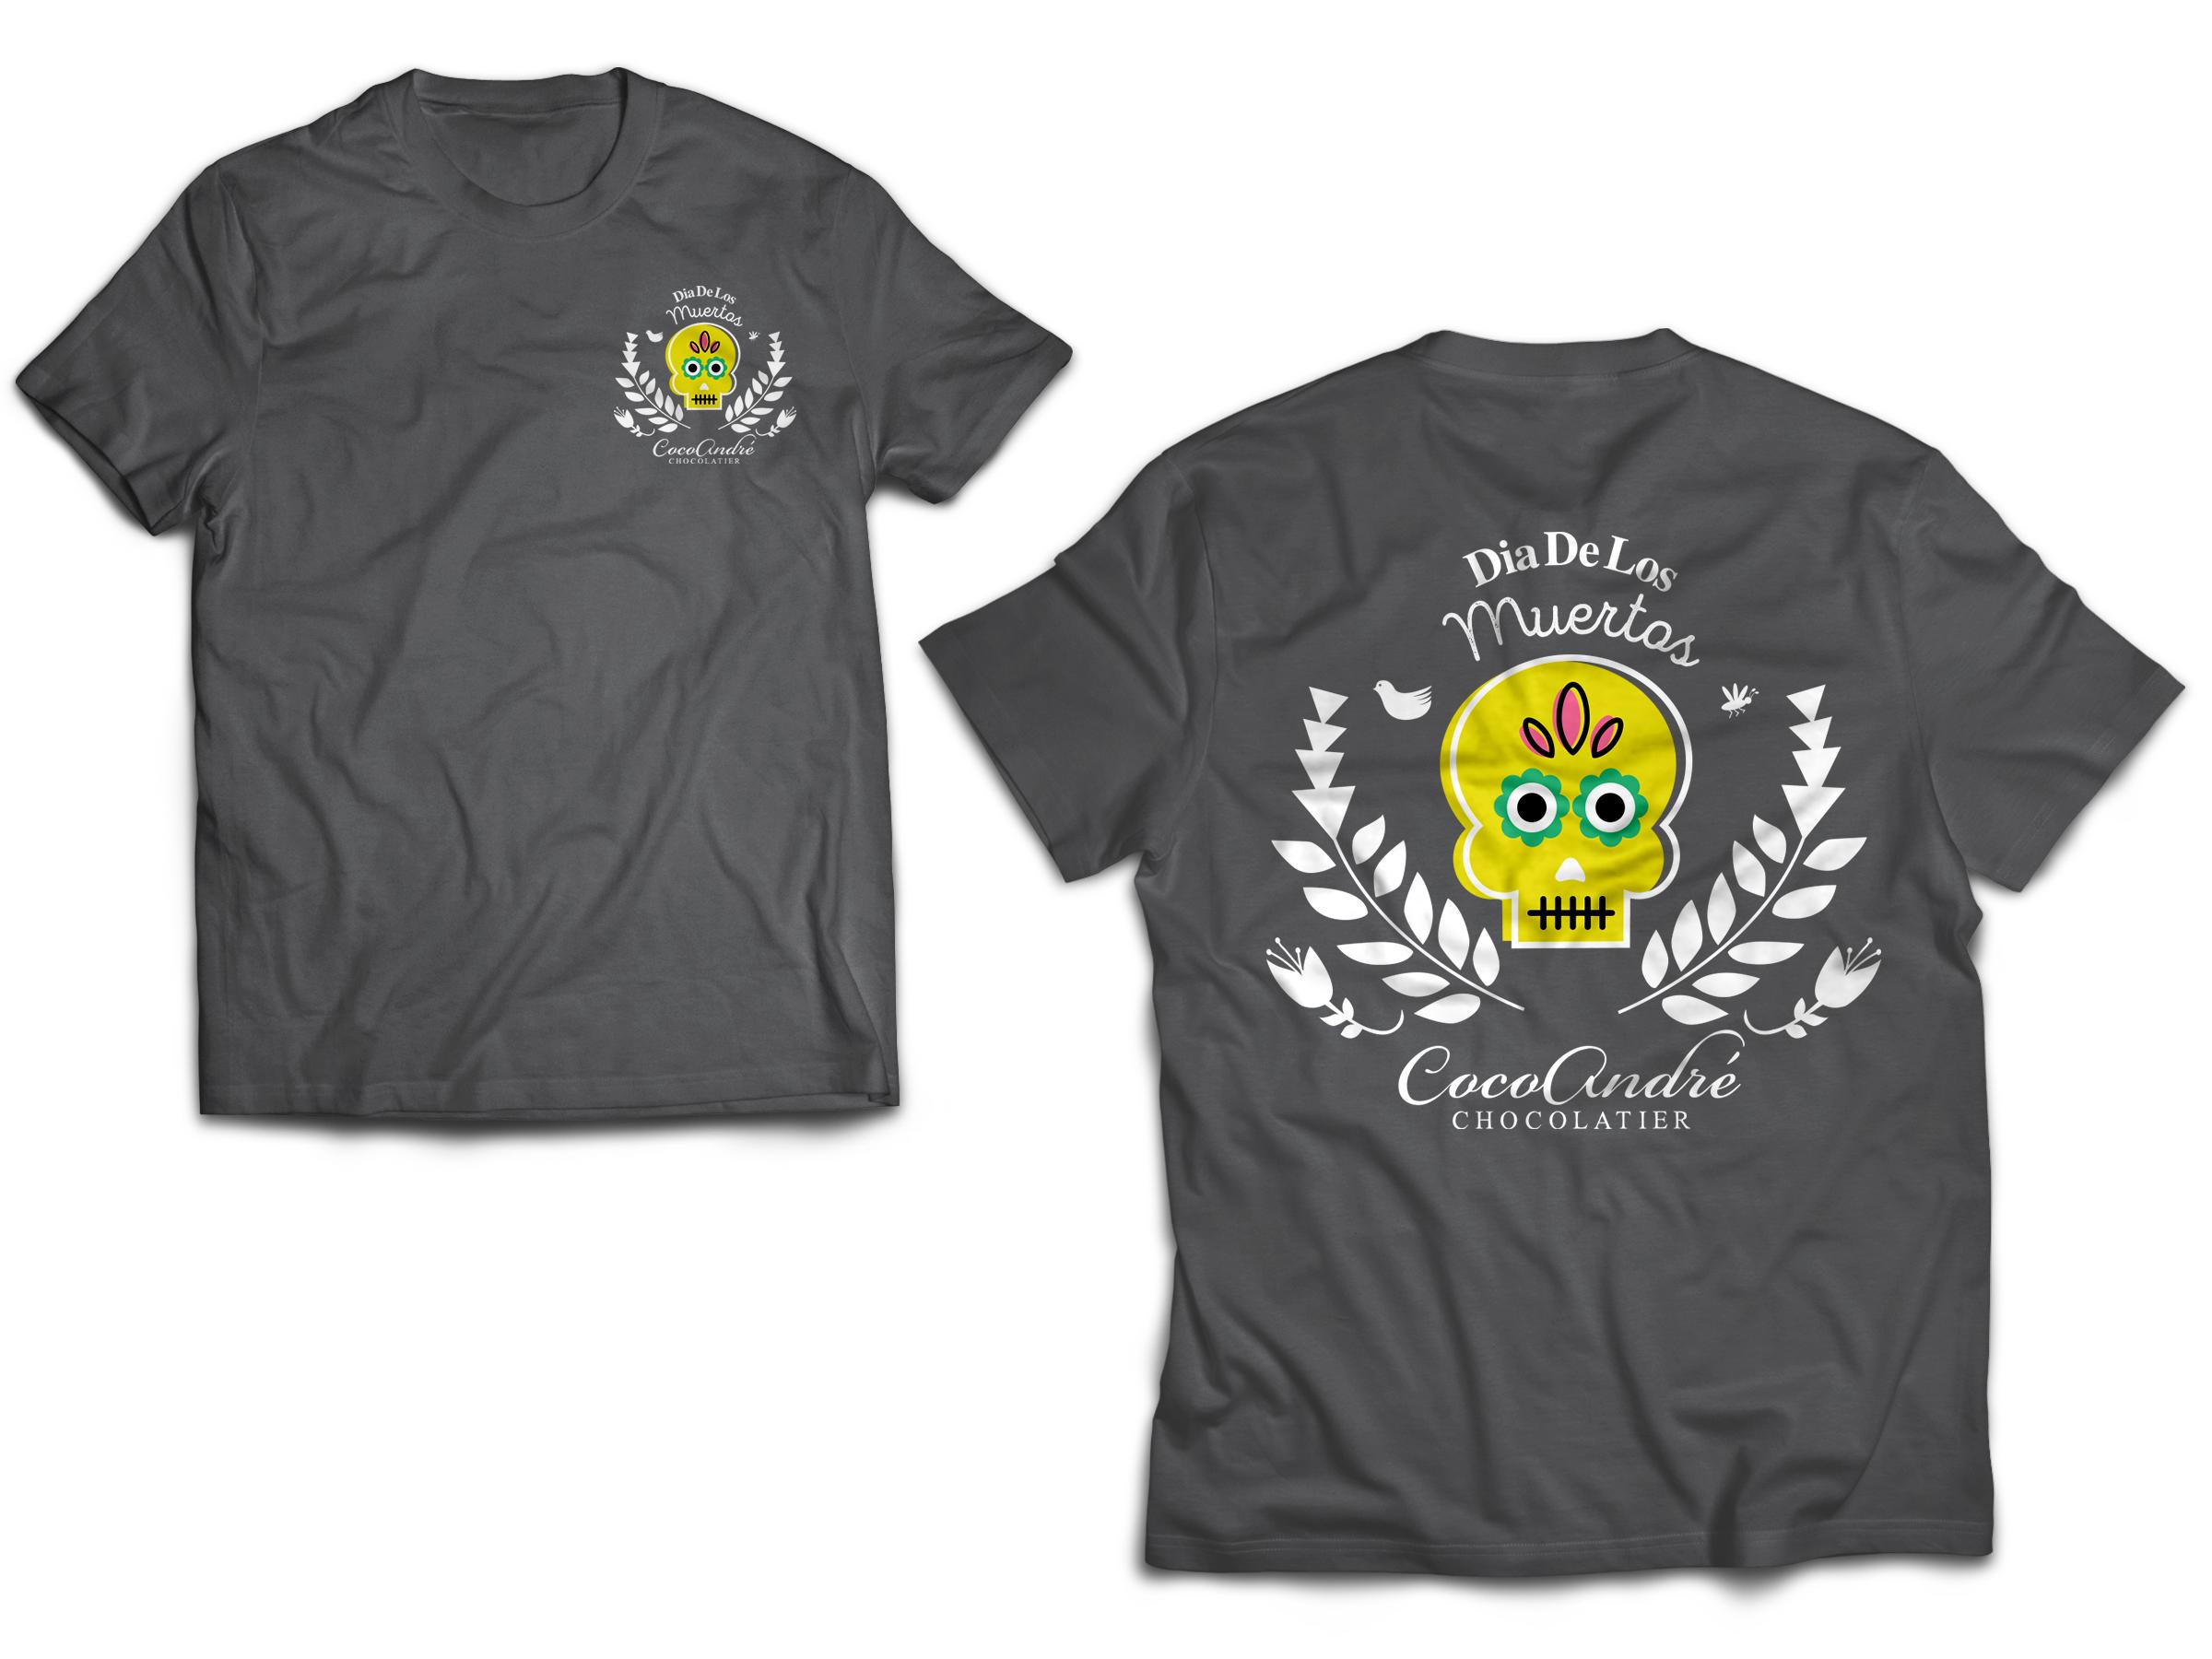 T-Shirt MockUp_Back_CocoAndre.png